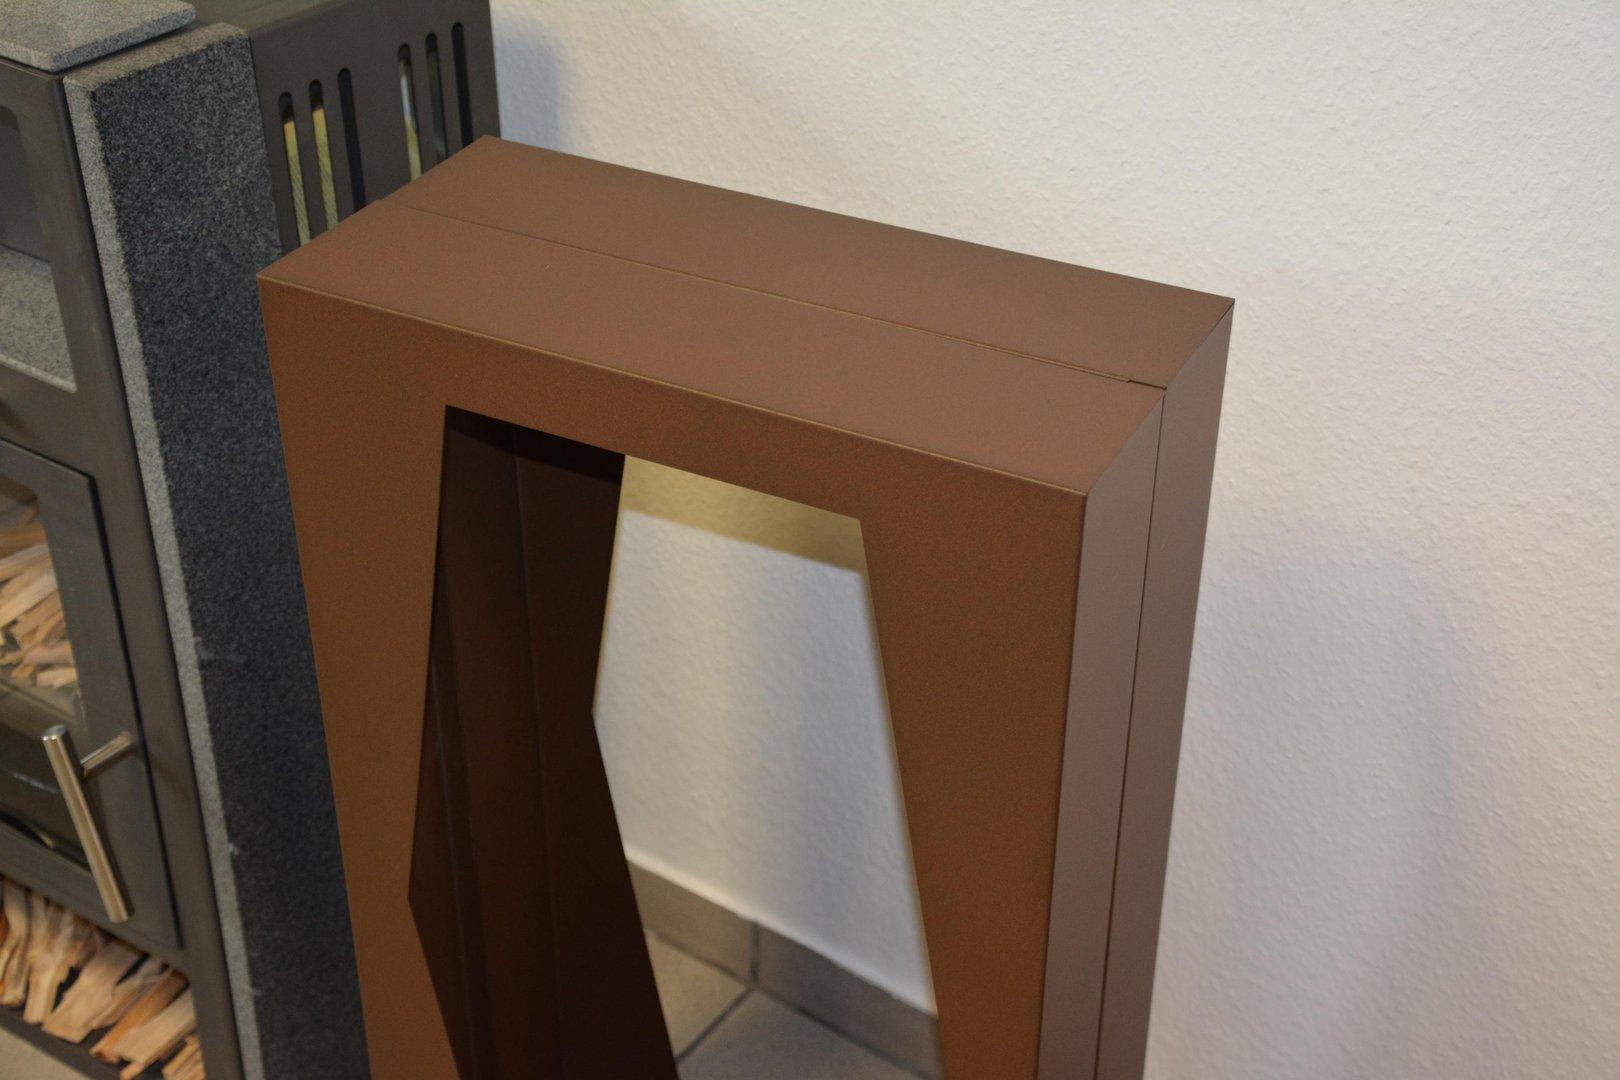 kaminholzregal raute innenbereich regal aus metall. Black Bedroom Furniture Sets. Home Design Ideas